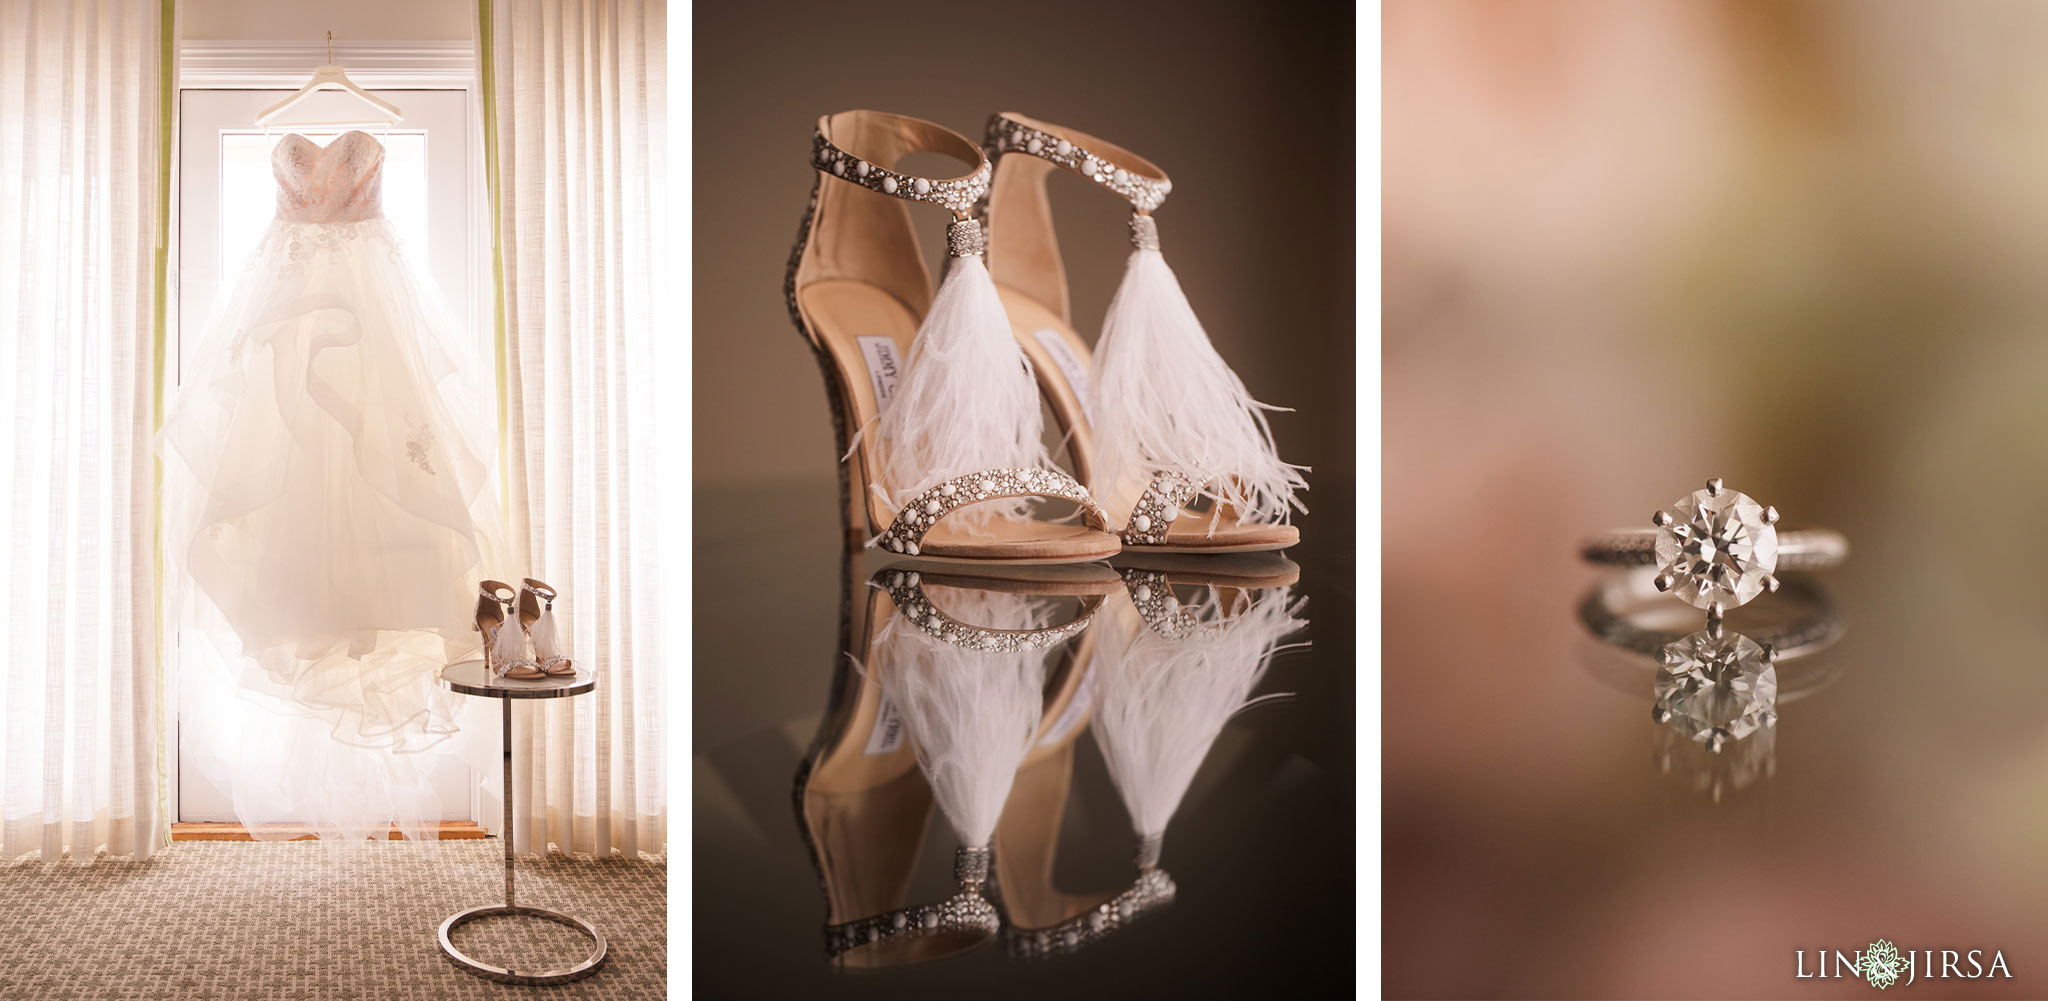 zbf monarch beach resort laguna niguel persian wedding photography